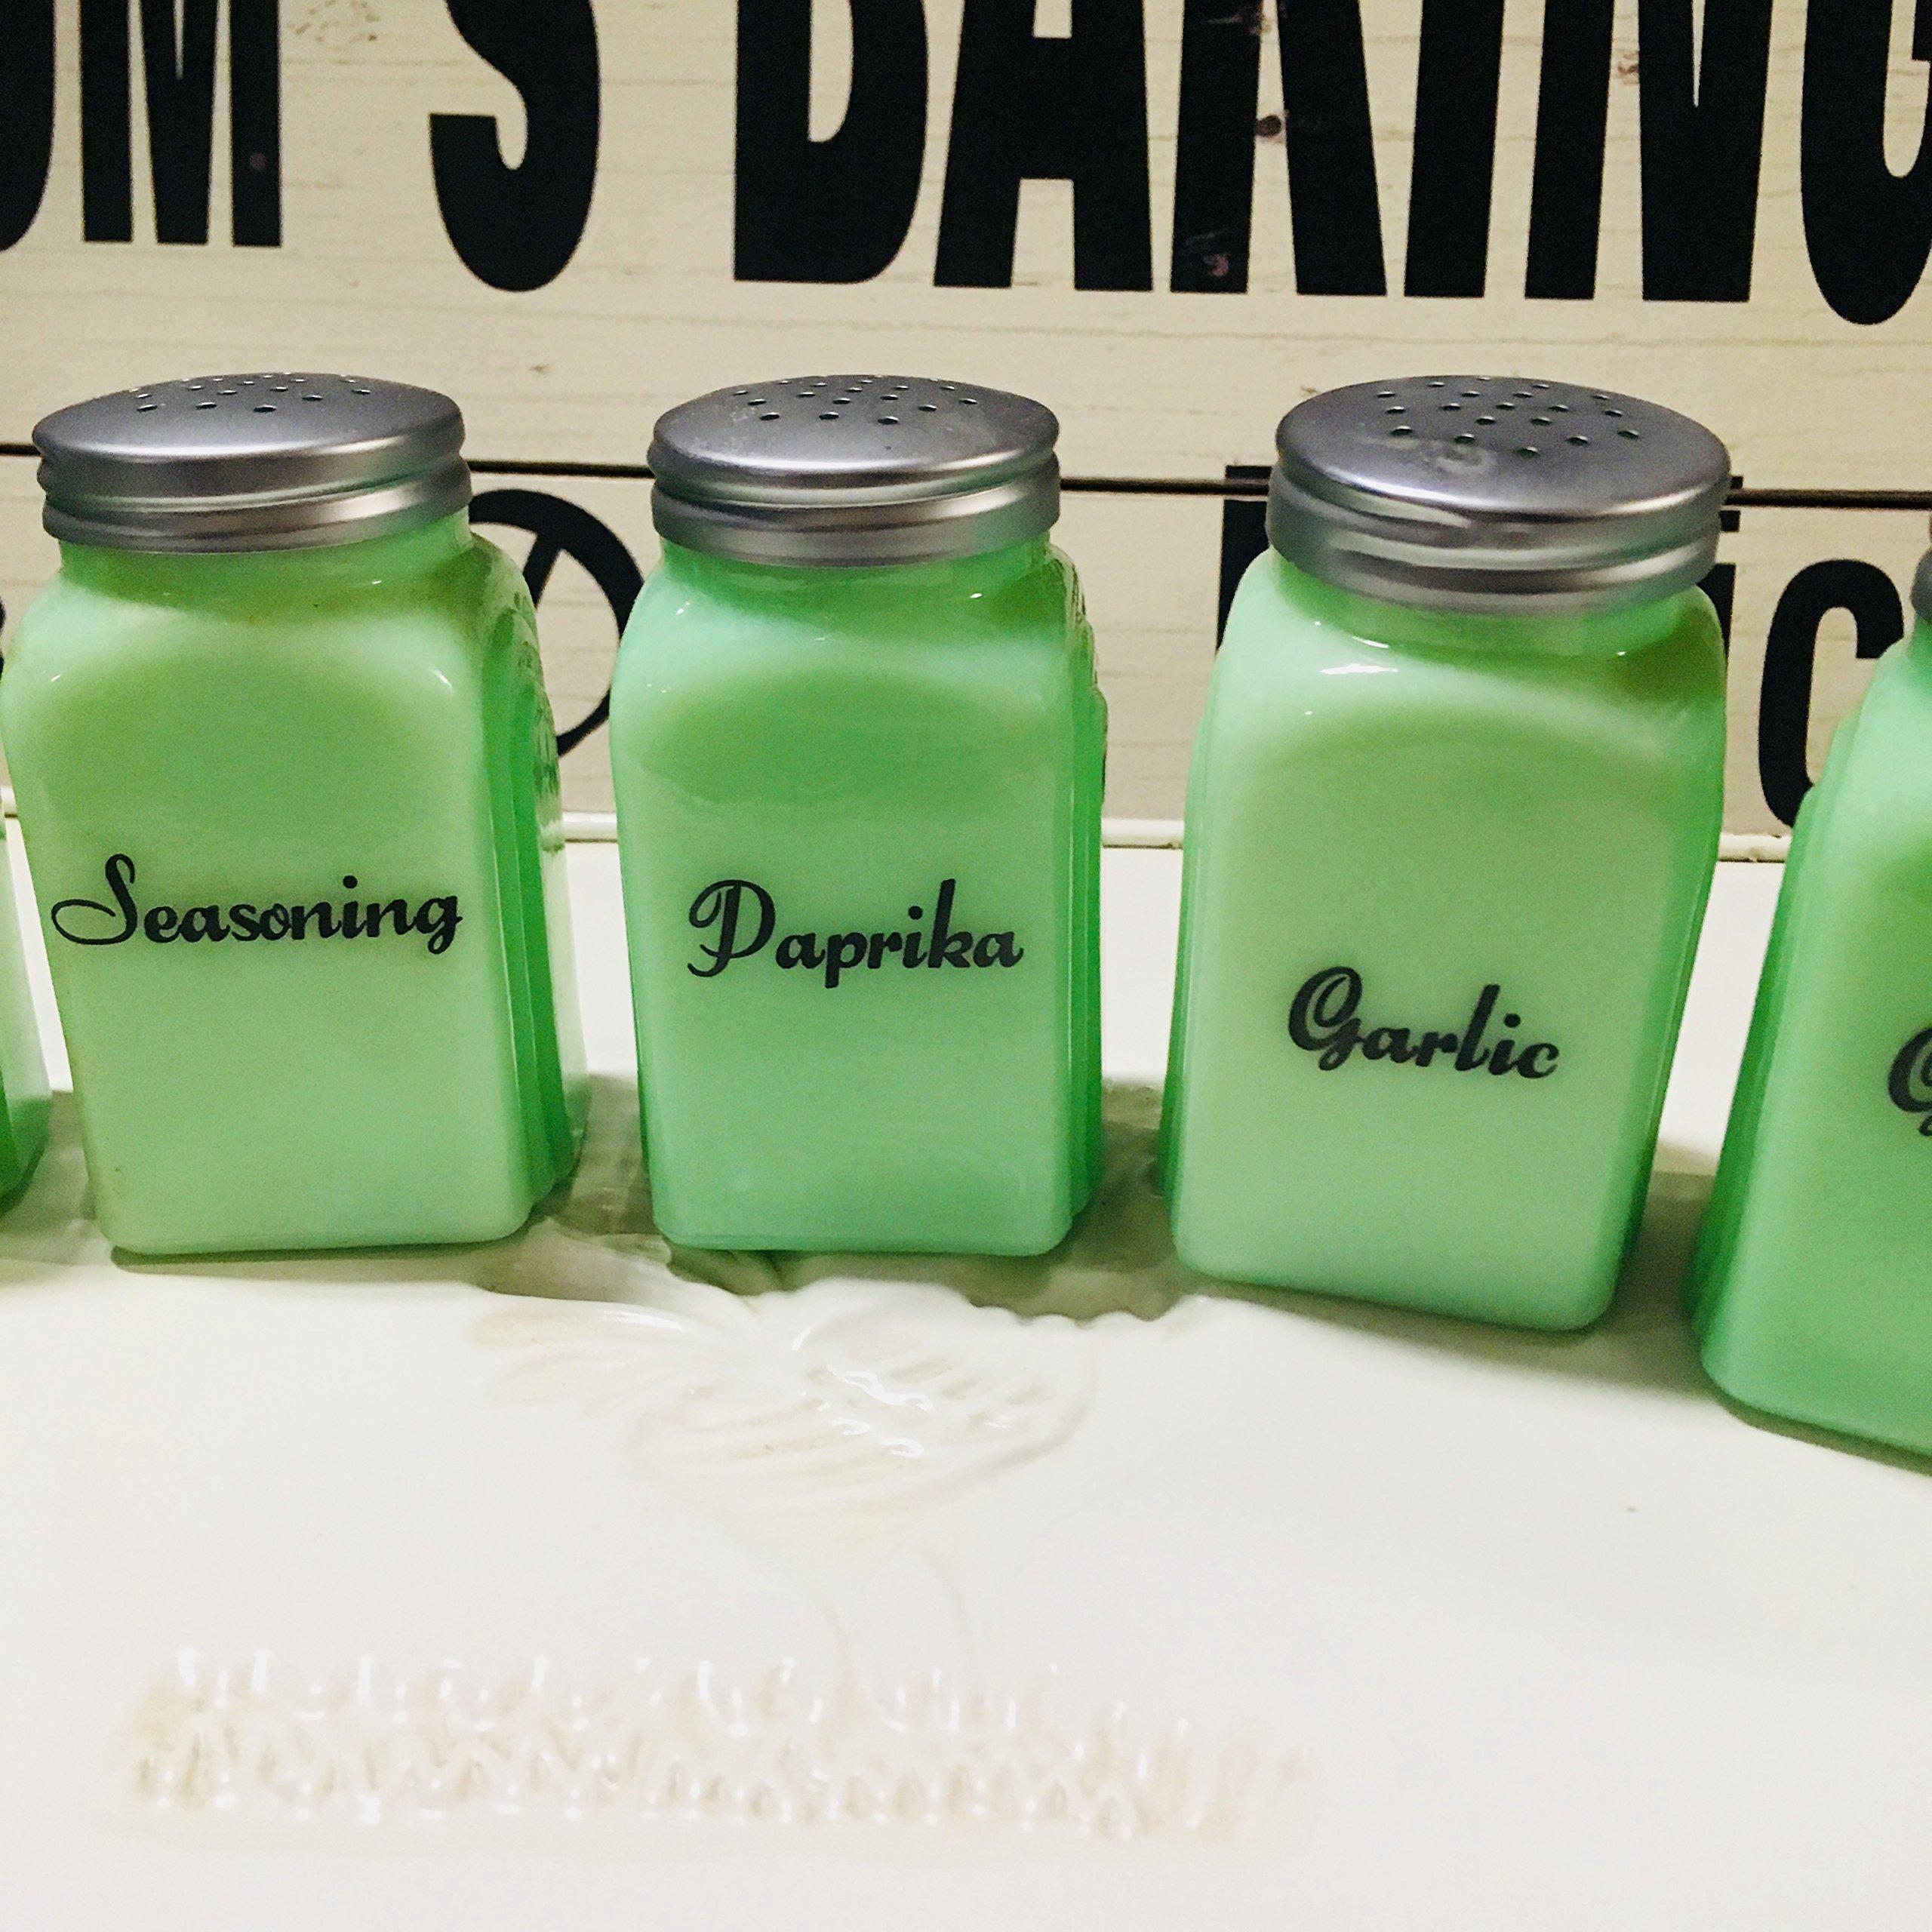 7 Piece GIFT SET - Jade Glass Spice Shakers Set (Spice, Sugar, Seasoning, Paprika, Garlic, Ginger, Cloves) Jadeite Jadite by Sweet Home at Barter Post (Image #4)